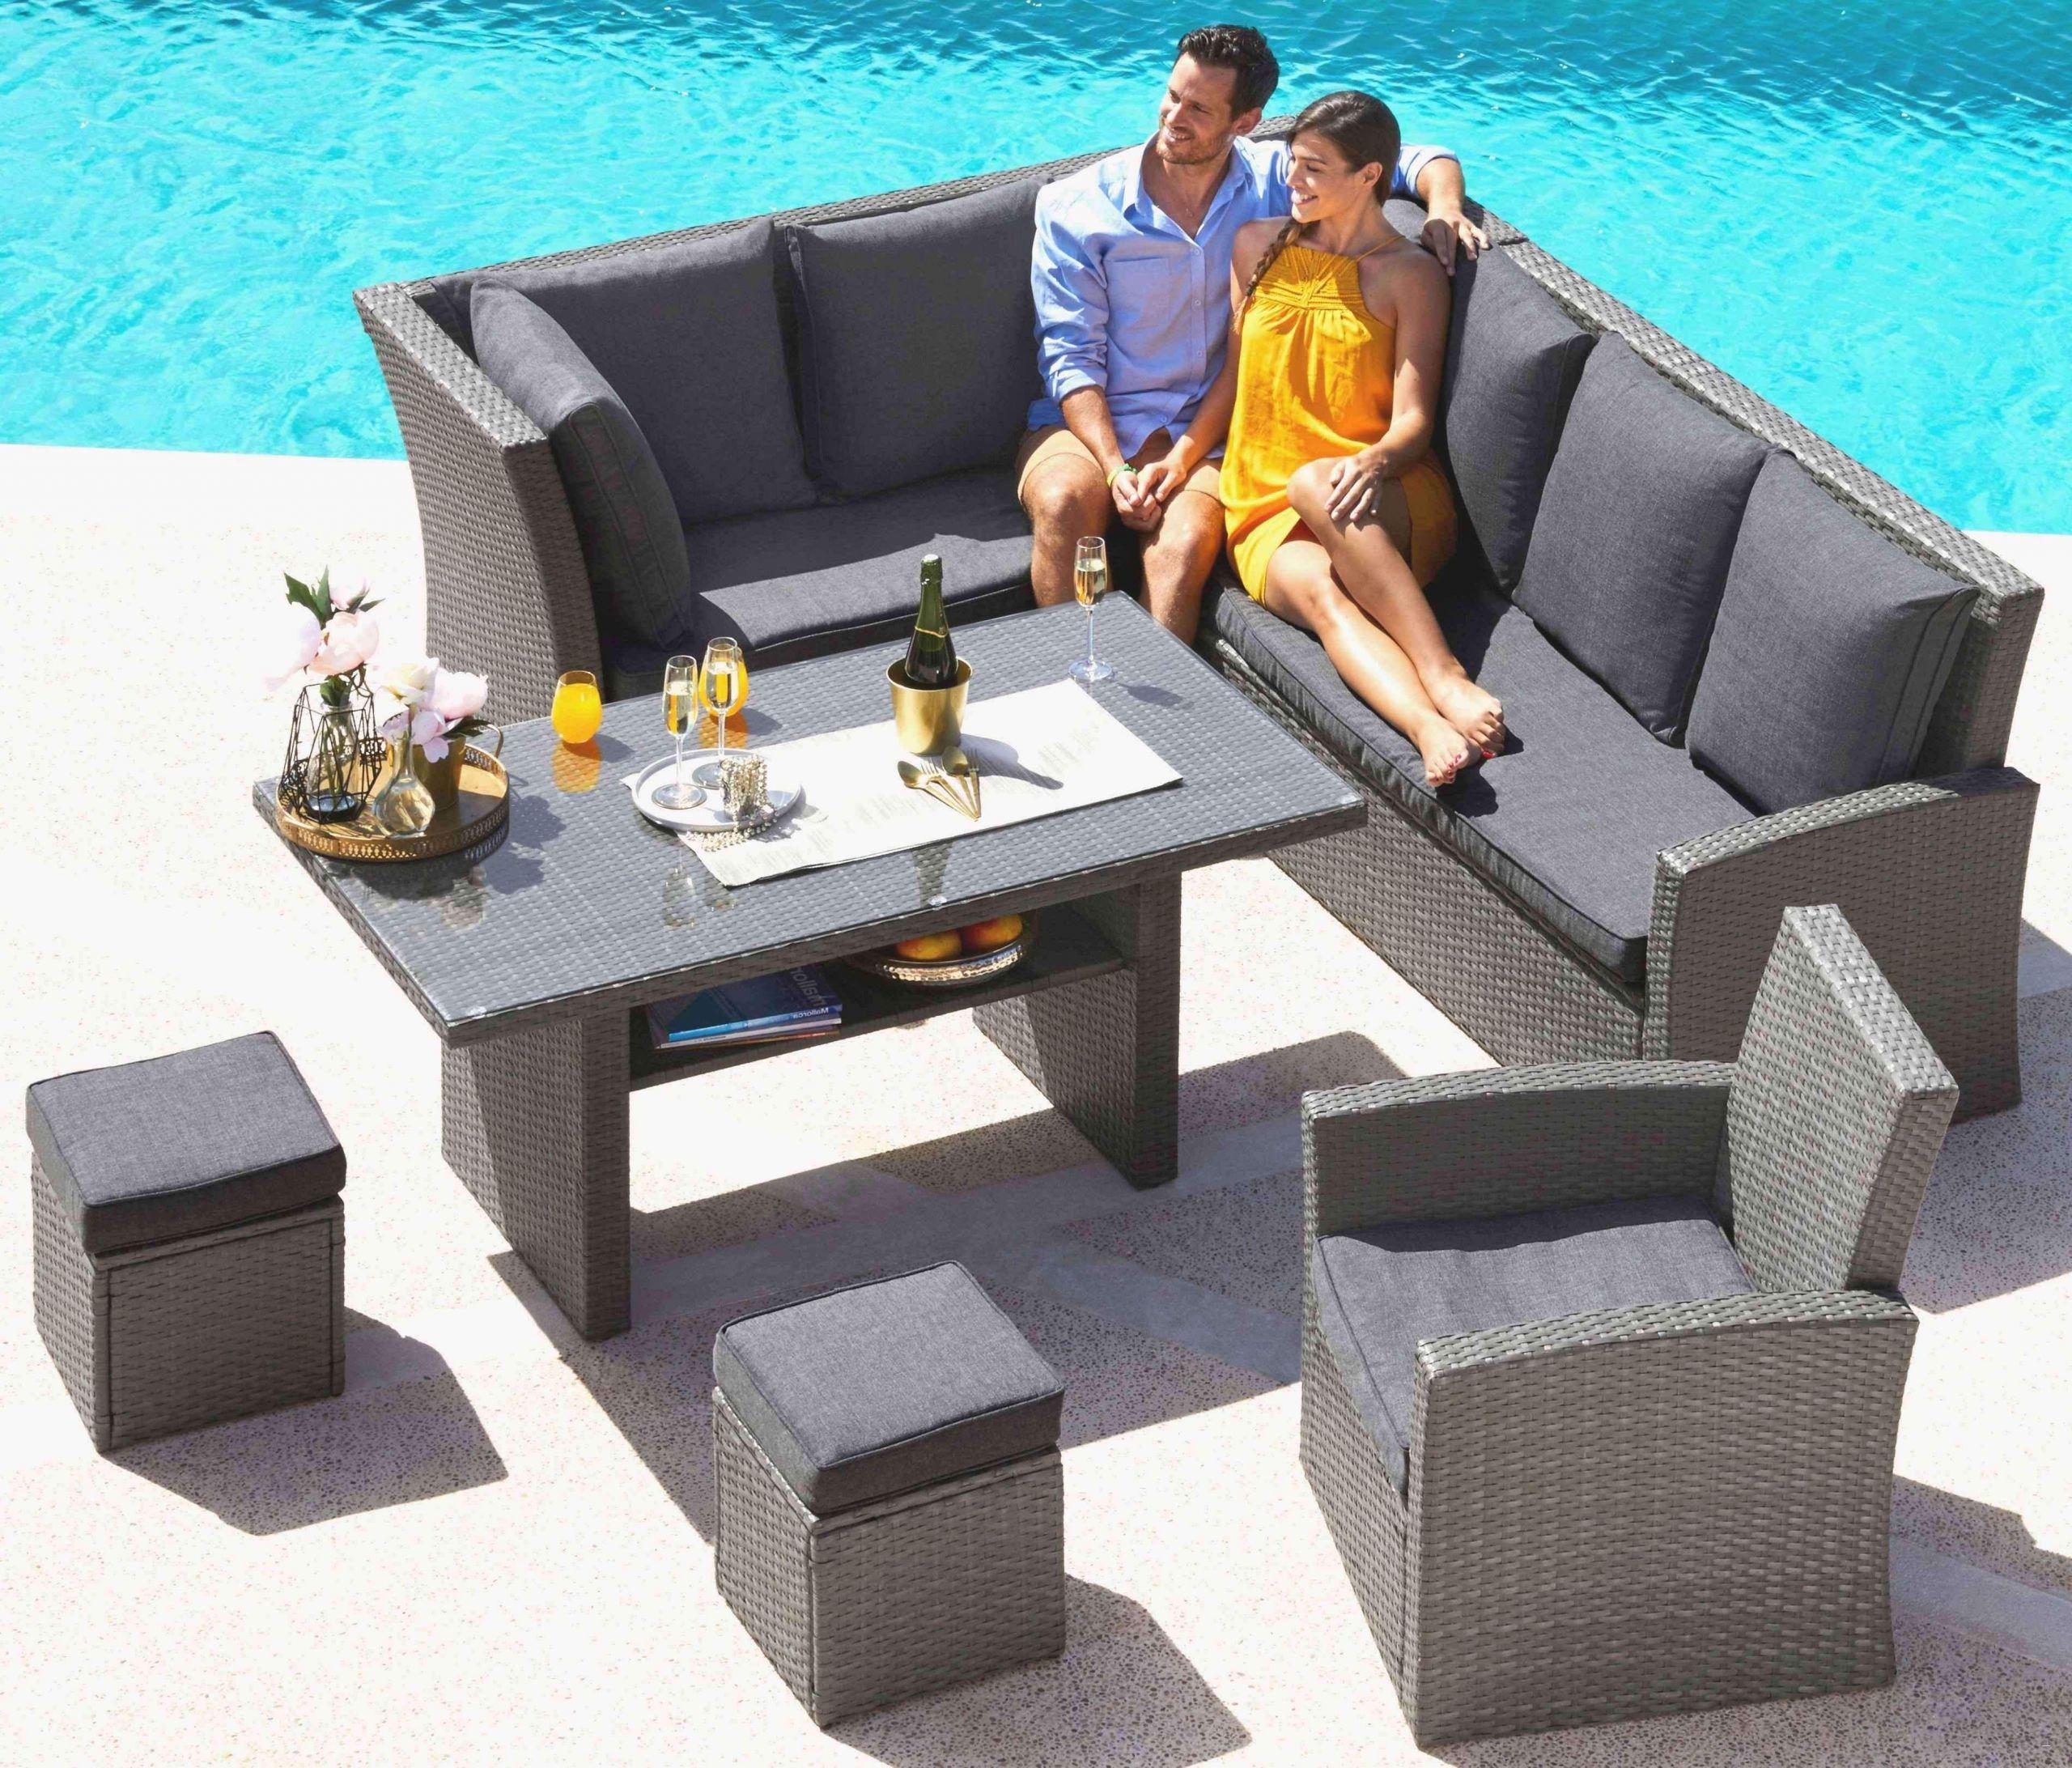 40 garten lounge sessel inspiration sxq7fvxn of lounge sessel terrasse